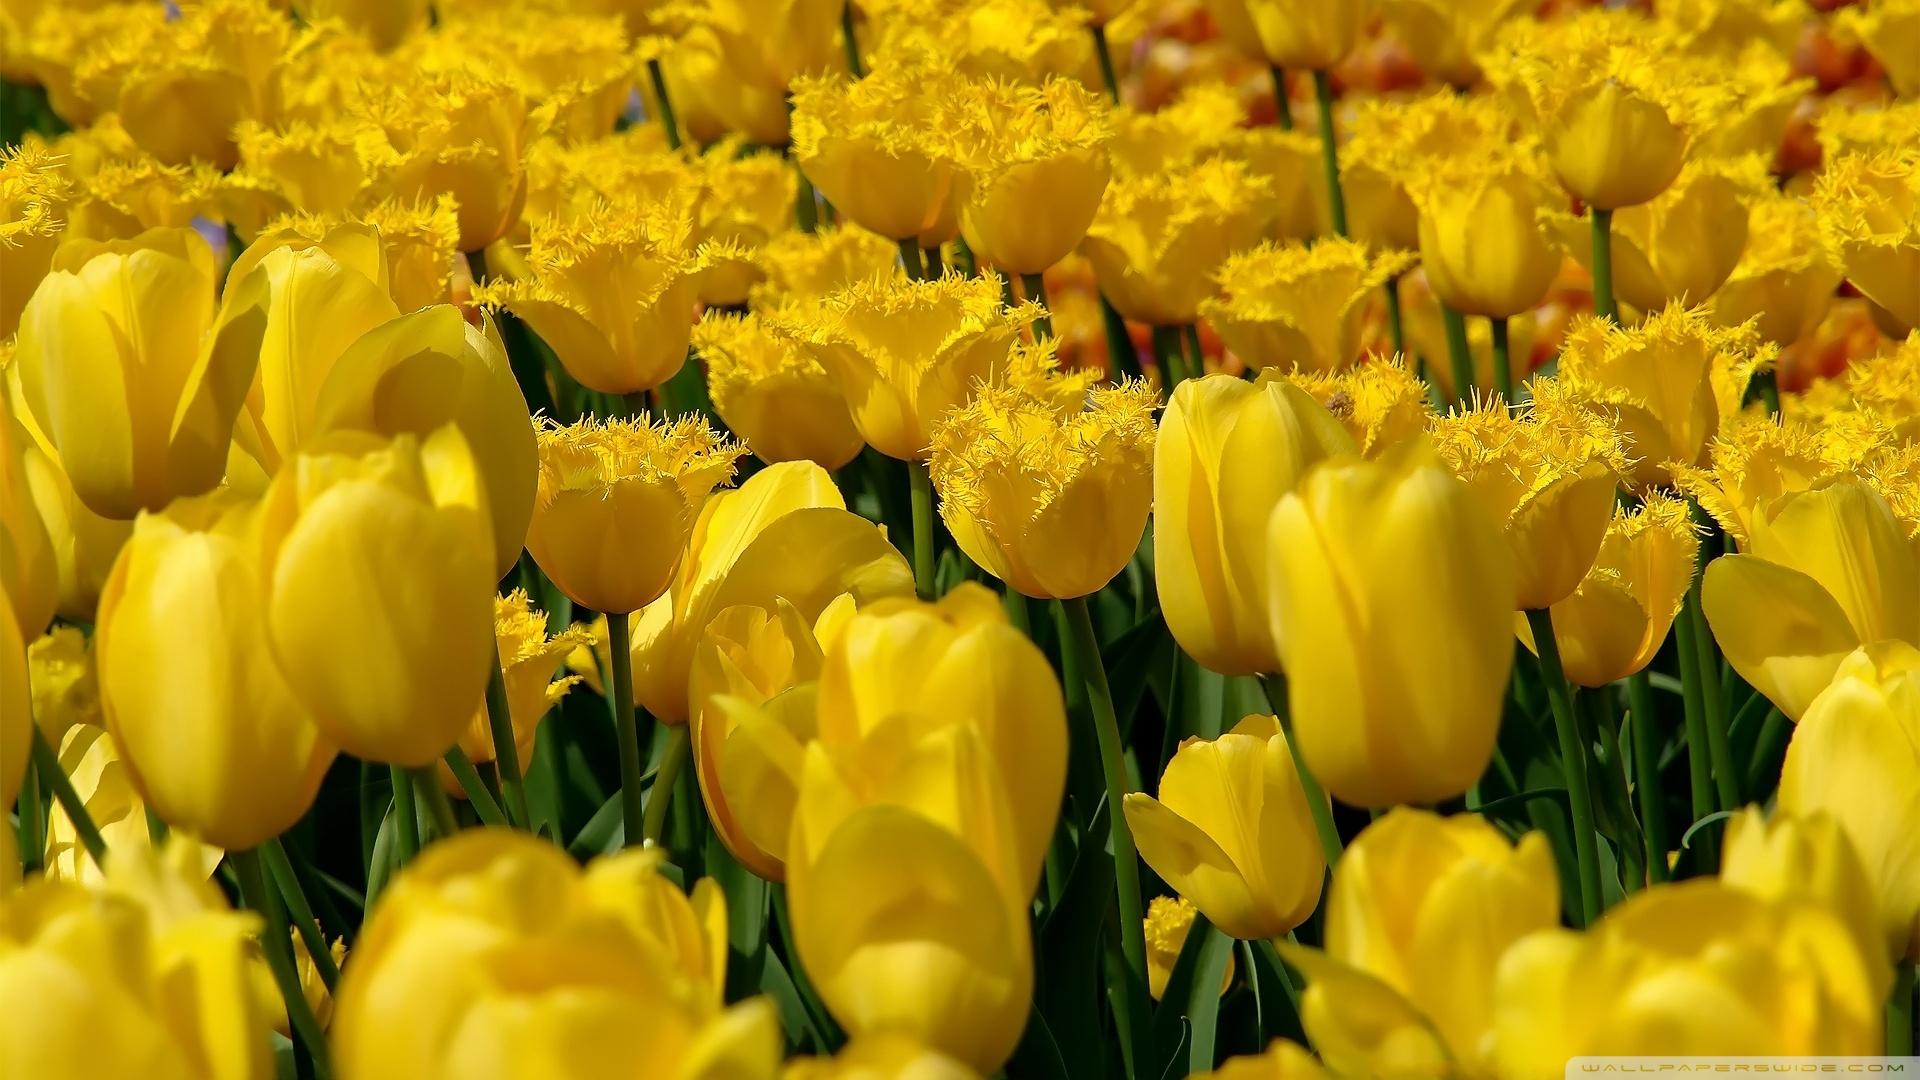 Fall Sunflower Desktop Wallpaper Yellow Tulips 4k Hd Desktop Wallpaper For 4k Ultra Hd Tv